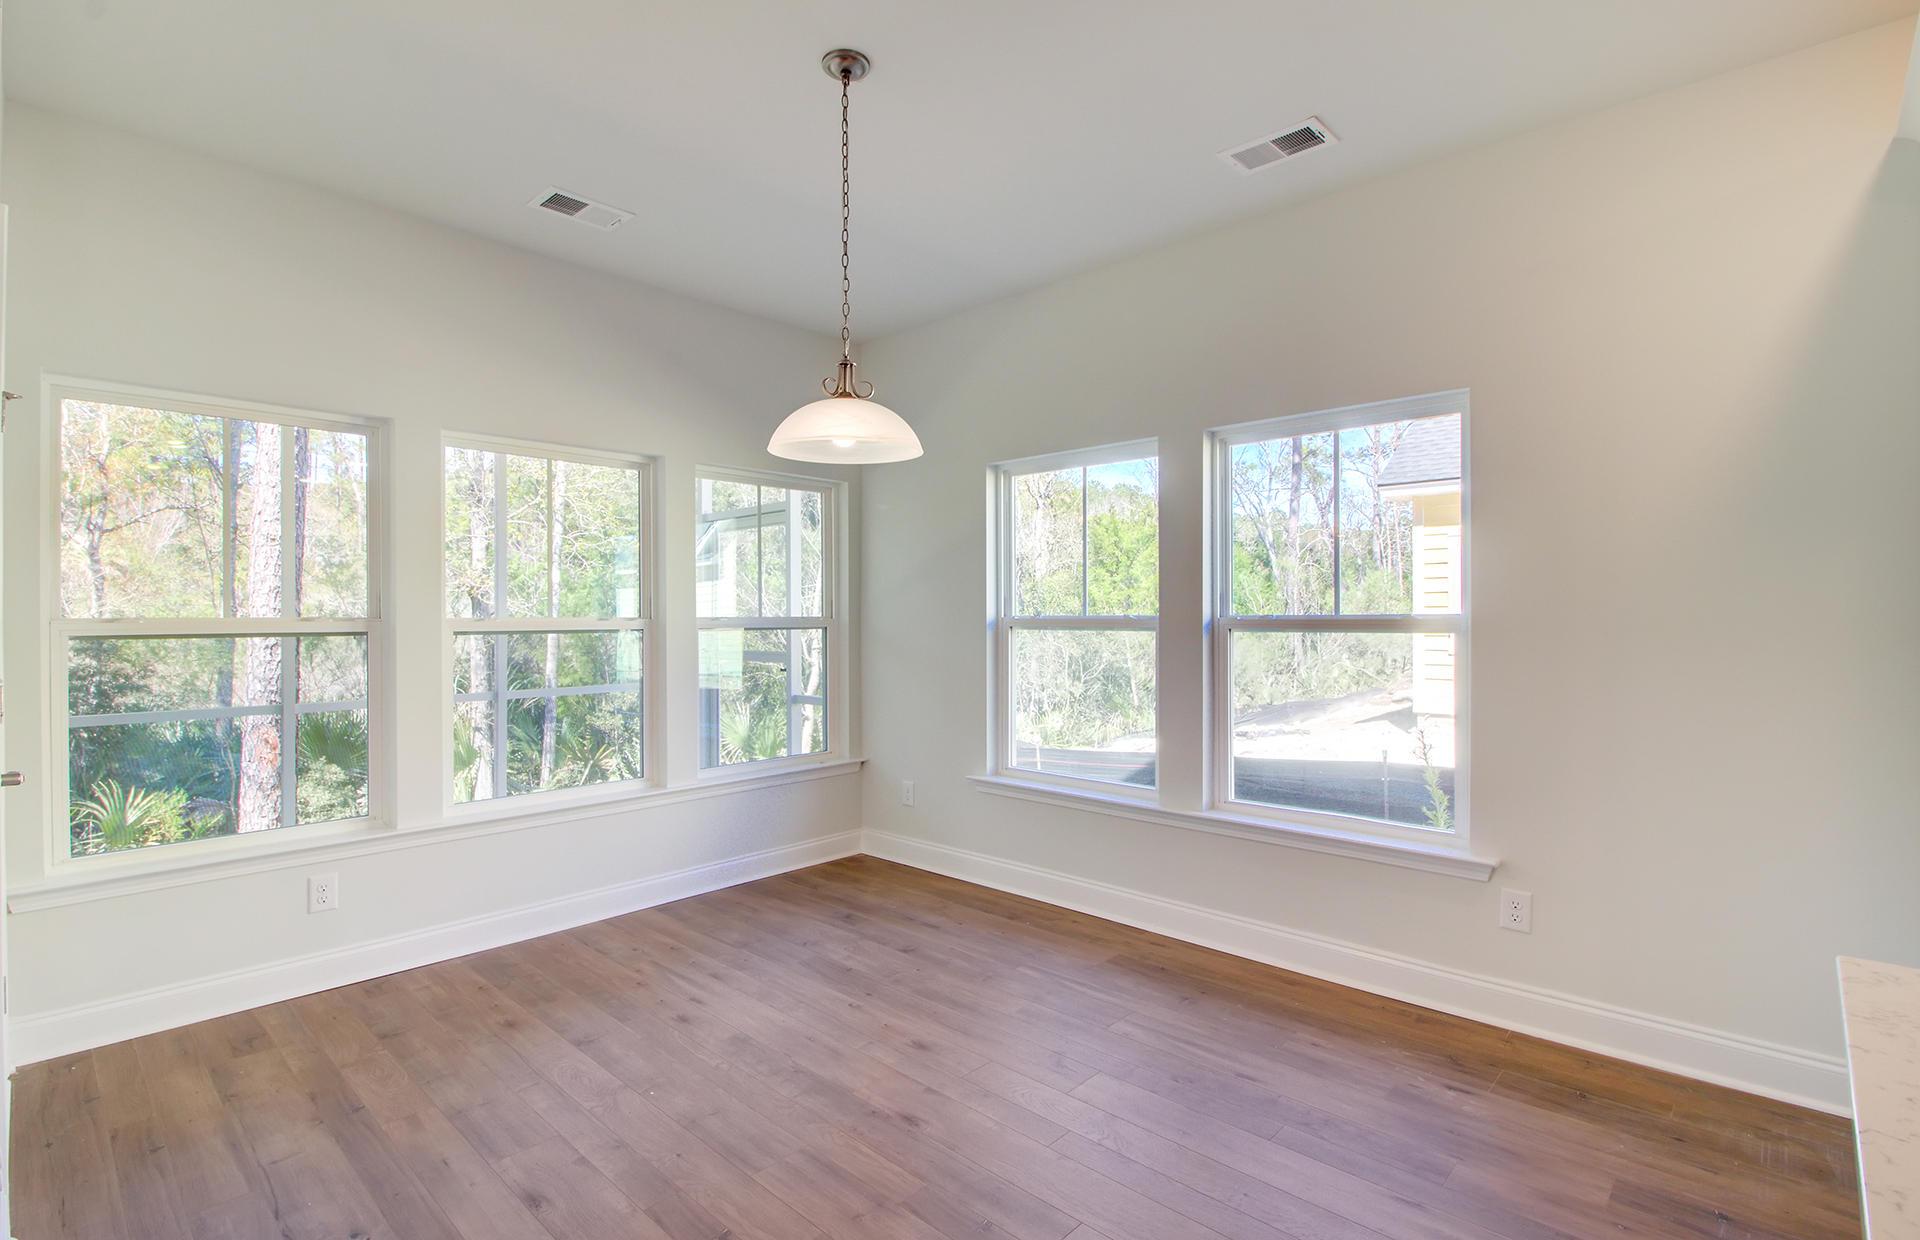 Park West Homes For Sale - 3066 Rice Field, Mount Pleasant, SC - 54